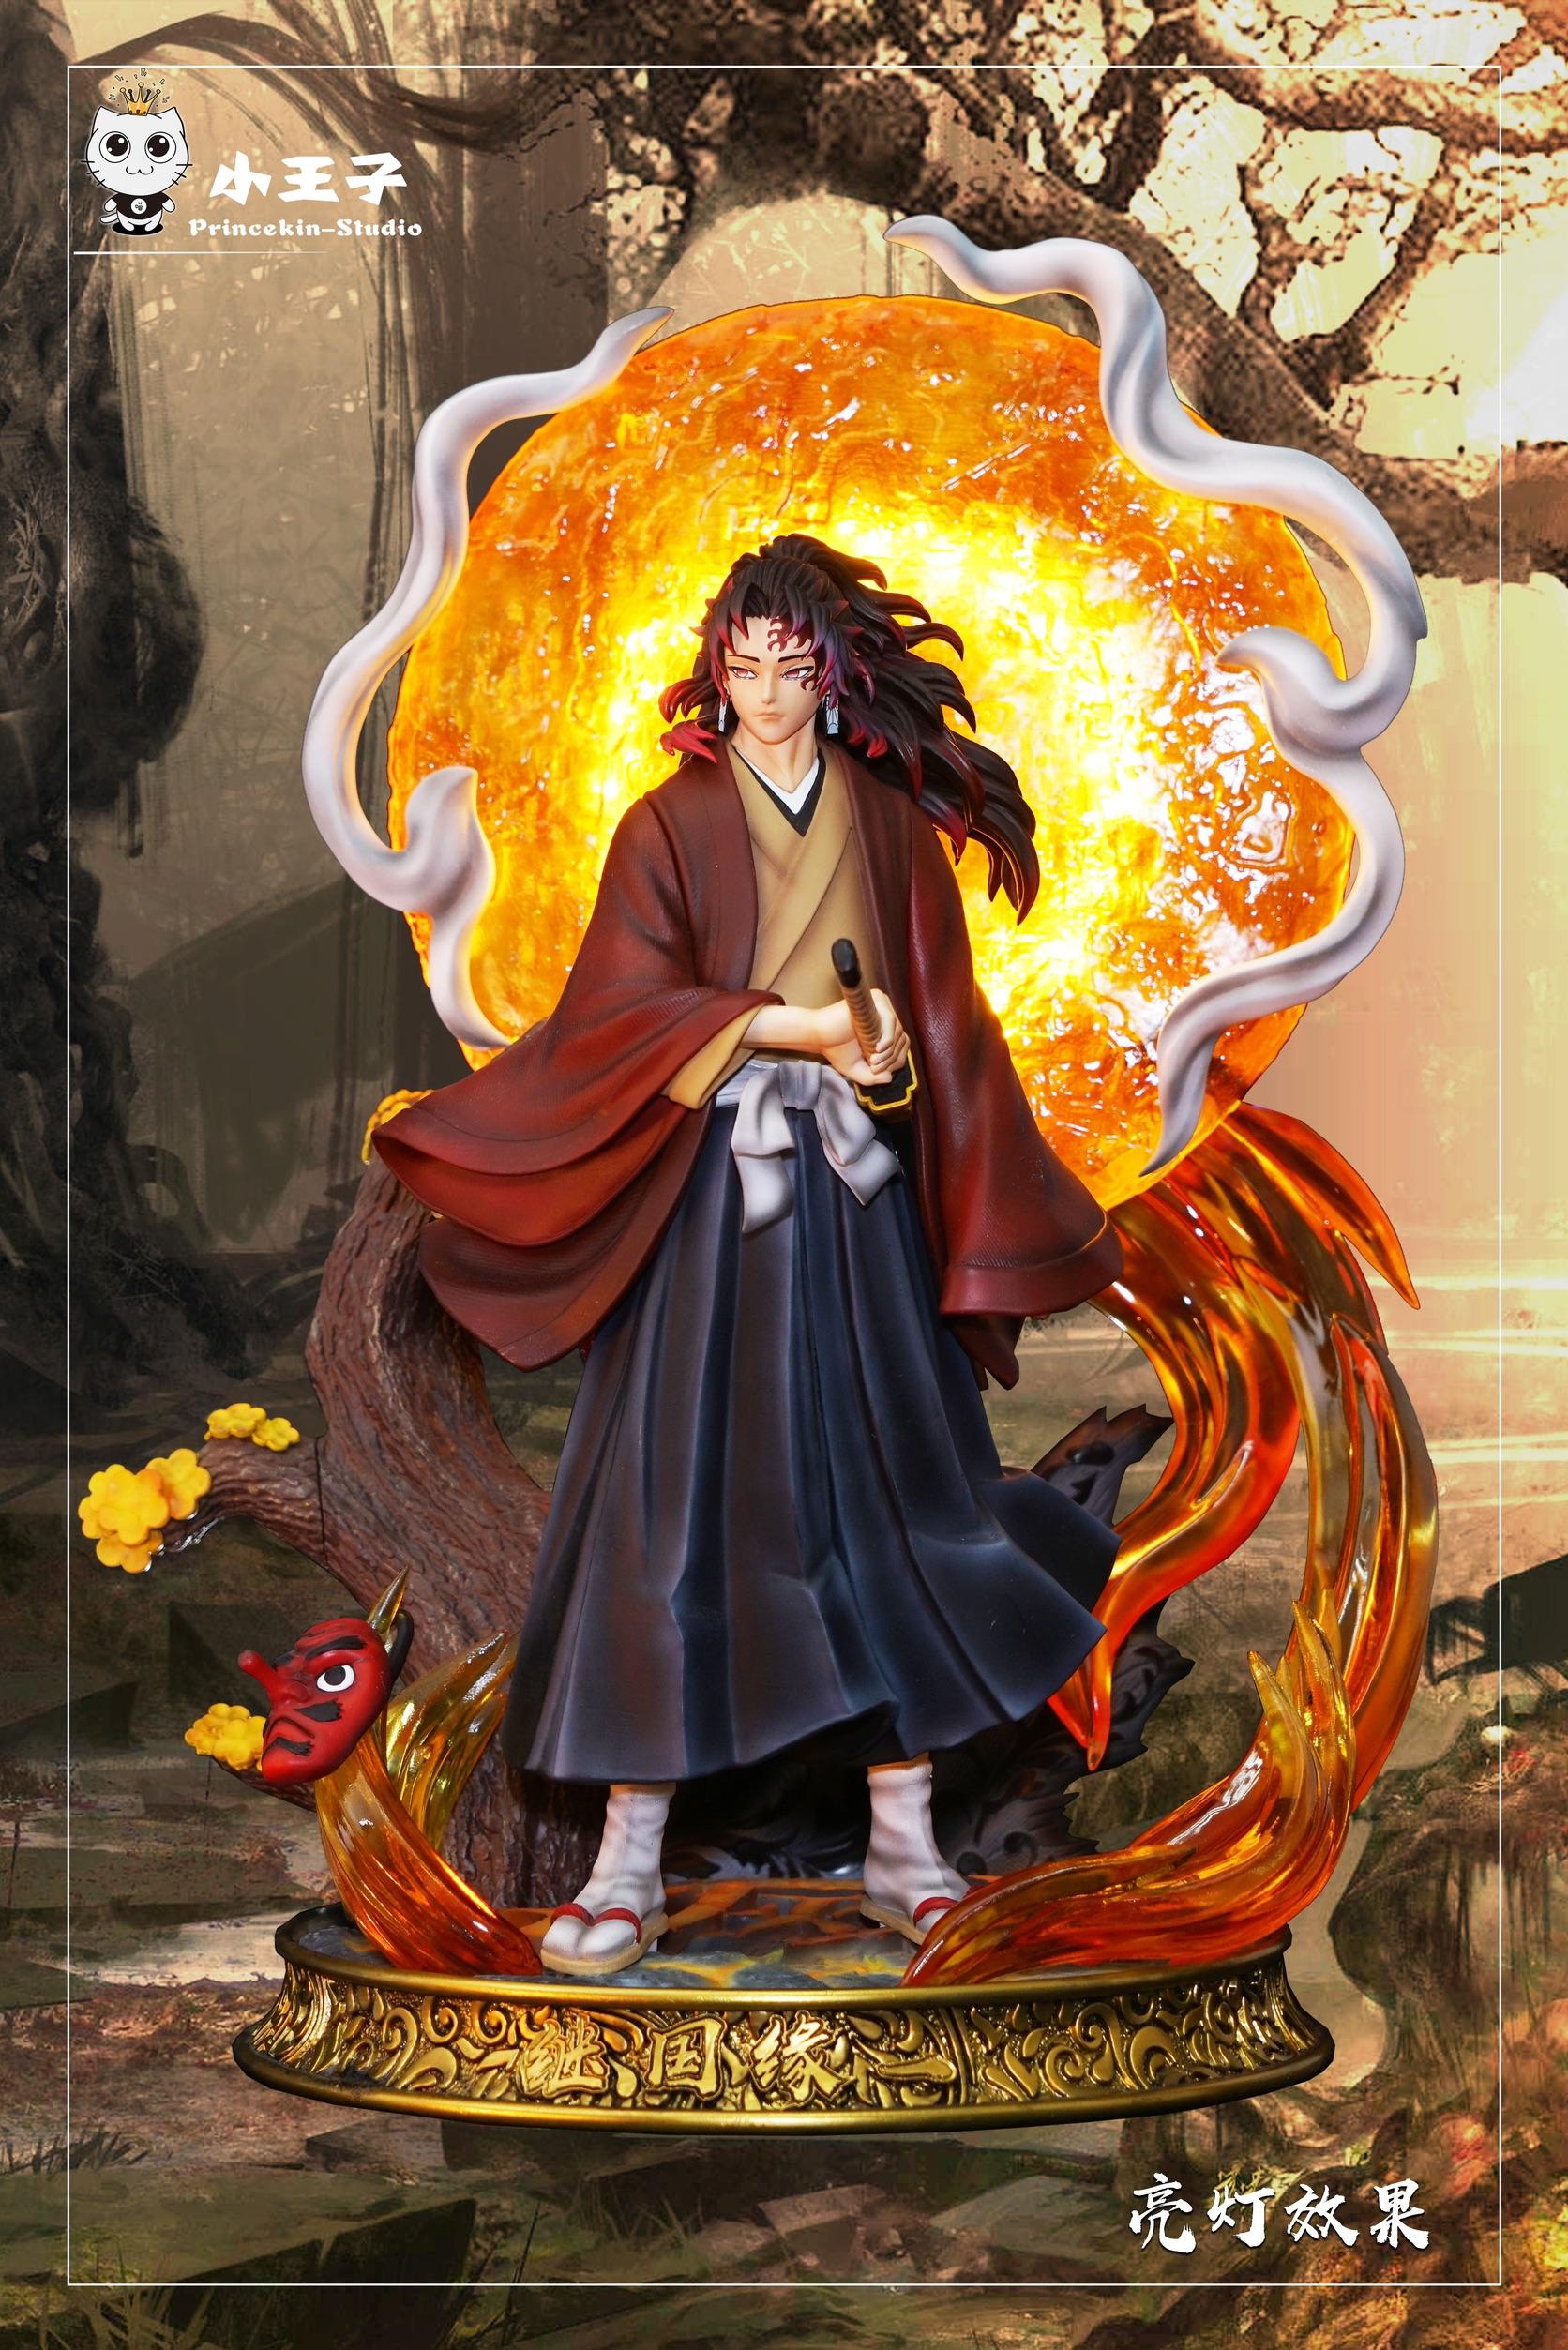 Yoriichi โยริอิจิ Princekin (มัดจำ)